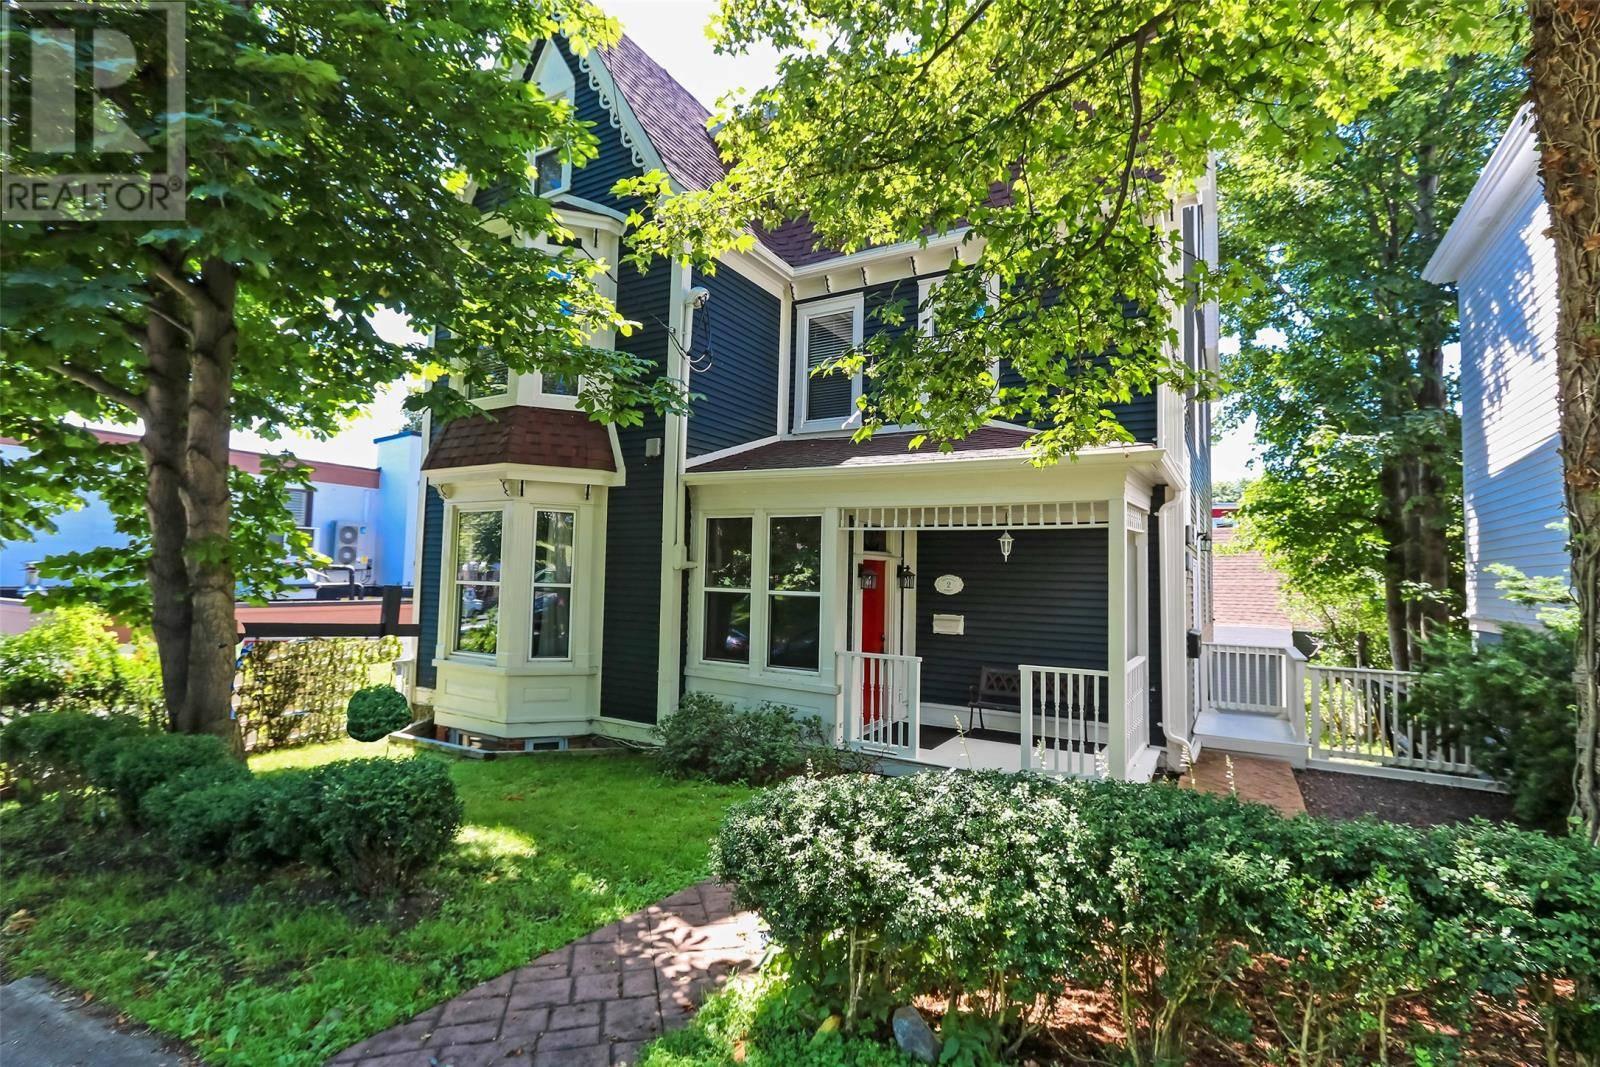 House for sale at 2 Ordnance St Unit 301 St. John's Newfoundland - MLS: 1211578